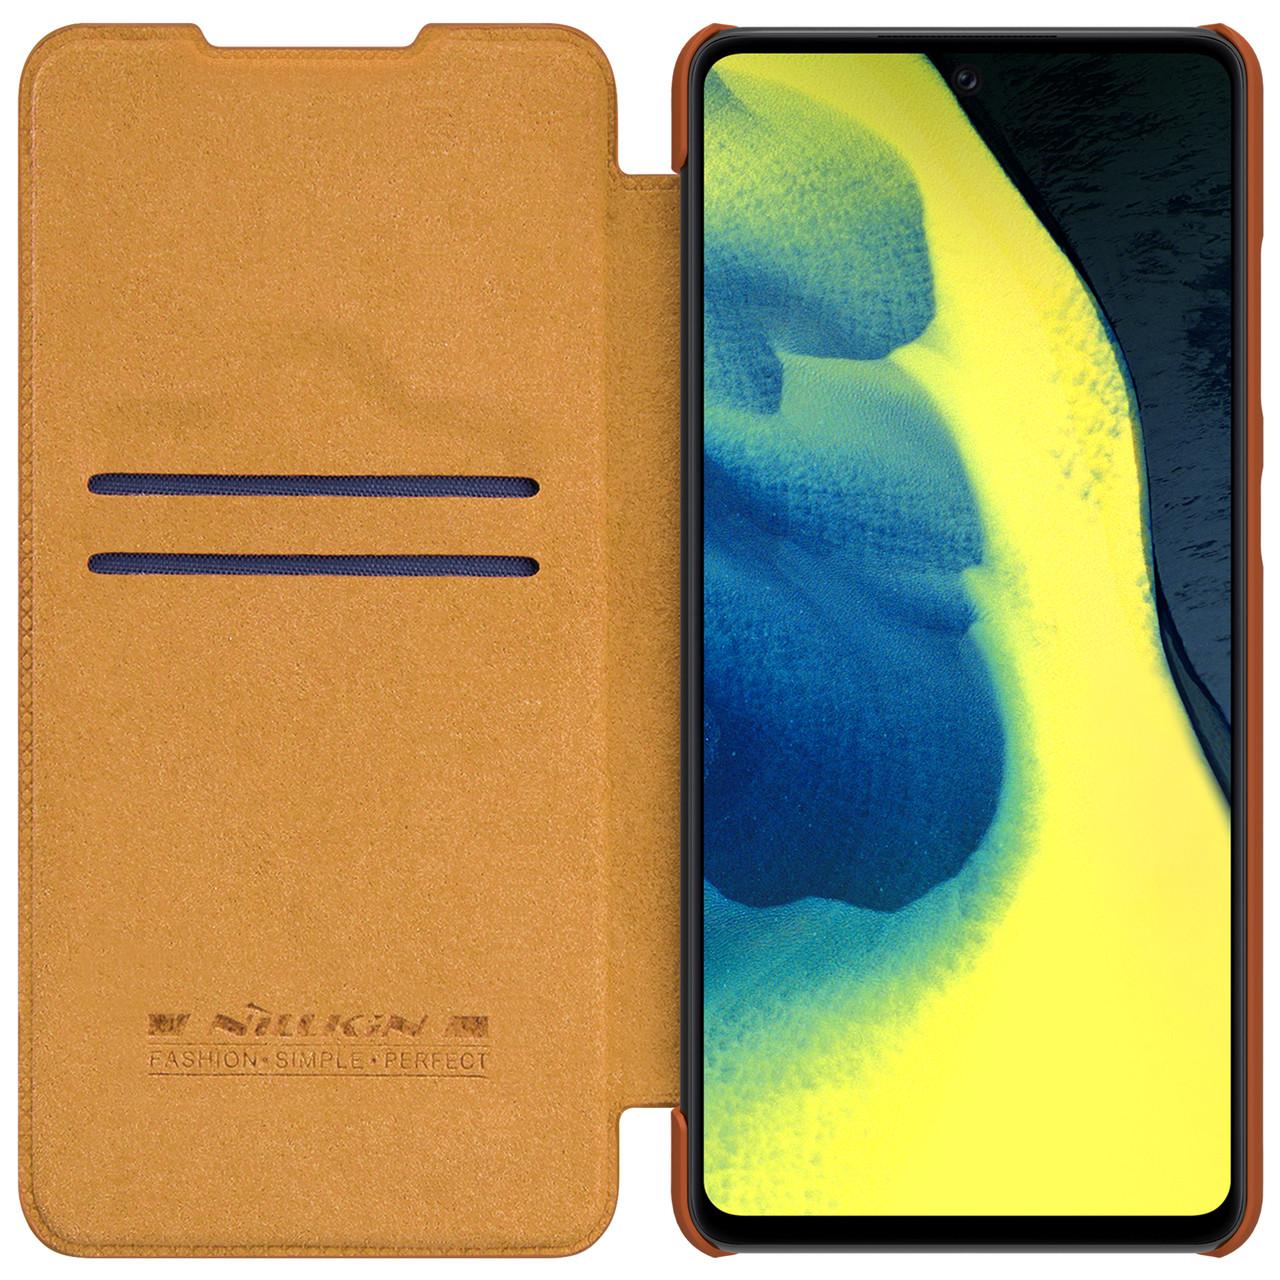 Защитный чехол-книжка Nillkin для Samsung Galaxy A72 5G (Qin leather case) Brown Коричневый